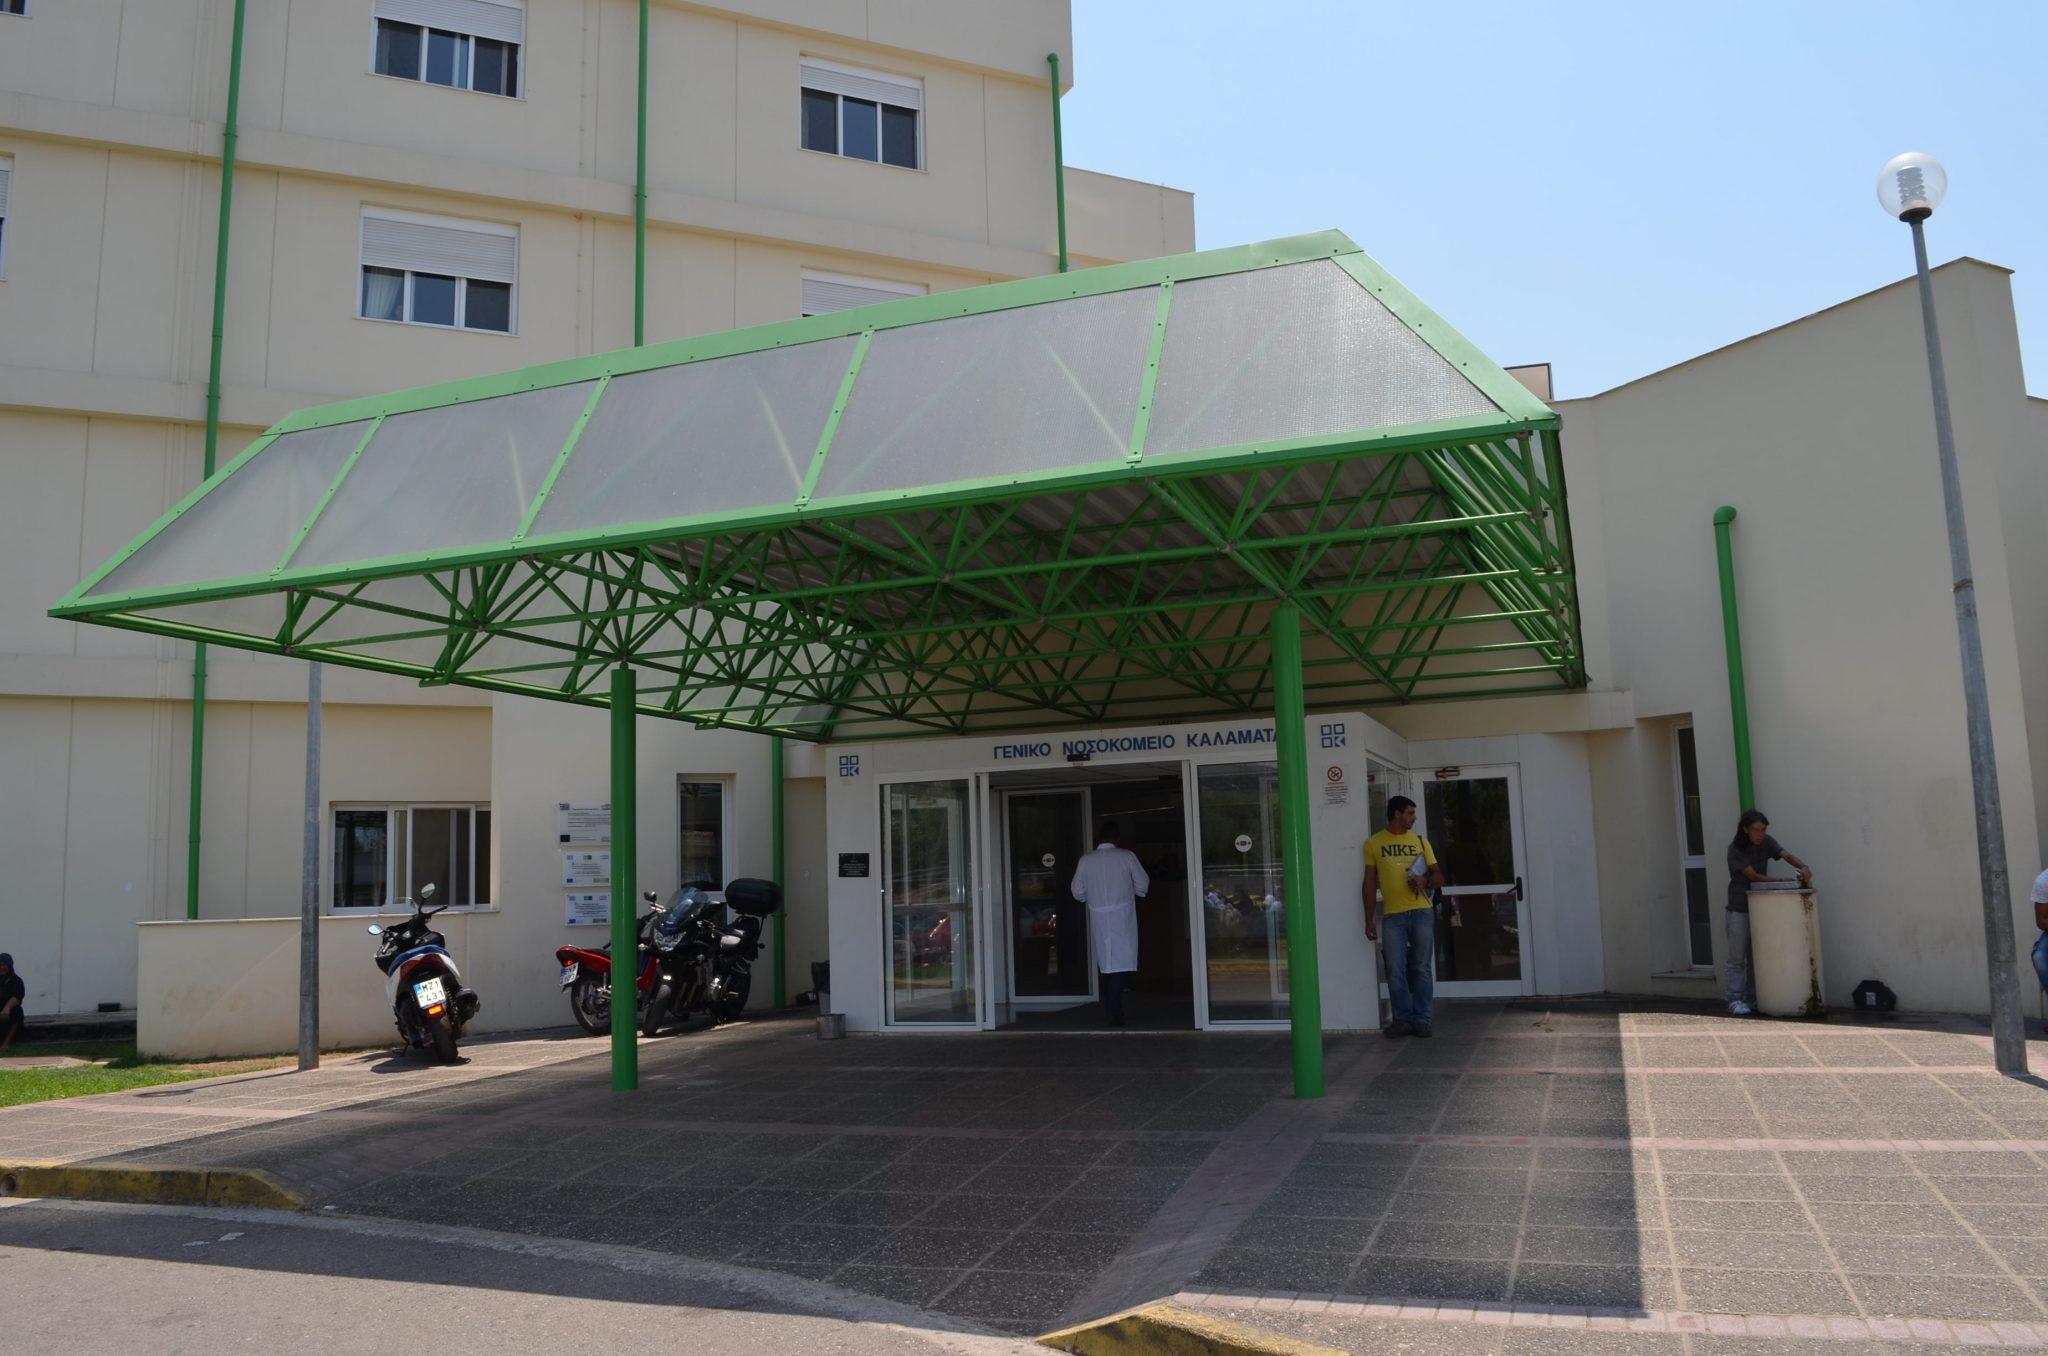 Noσοκομείο Καλαμάτας: Κάθε μέρα κερδίζει μάχες διεκδίκησης σε όλα τα επίπεδα